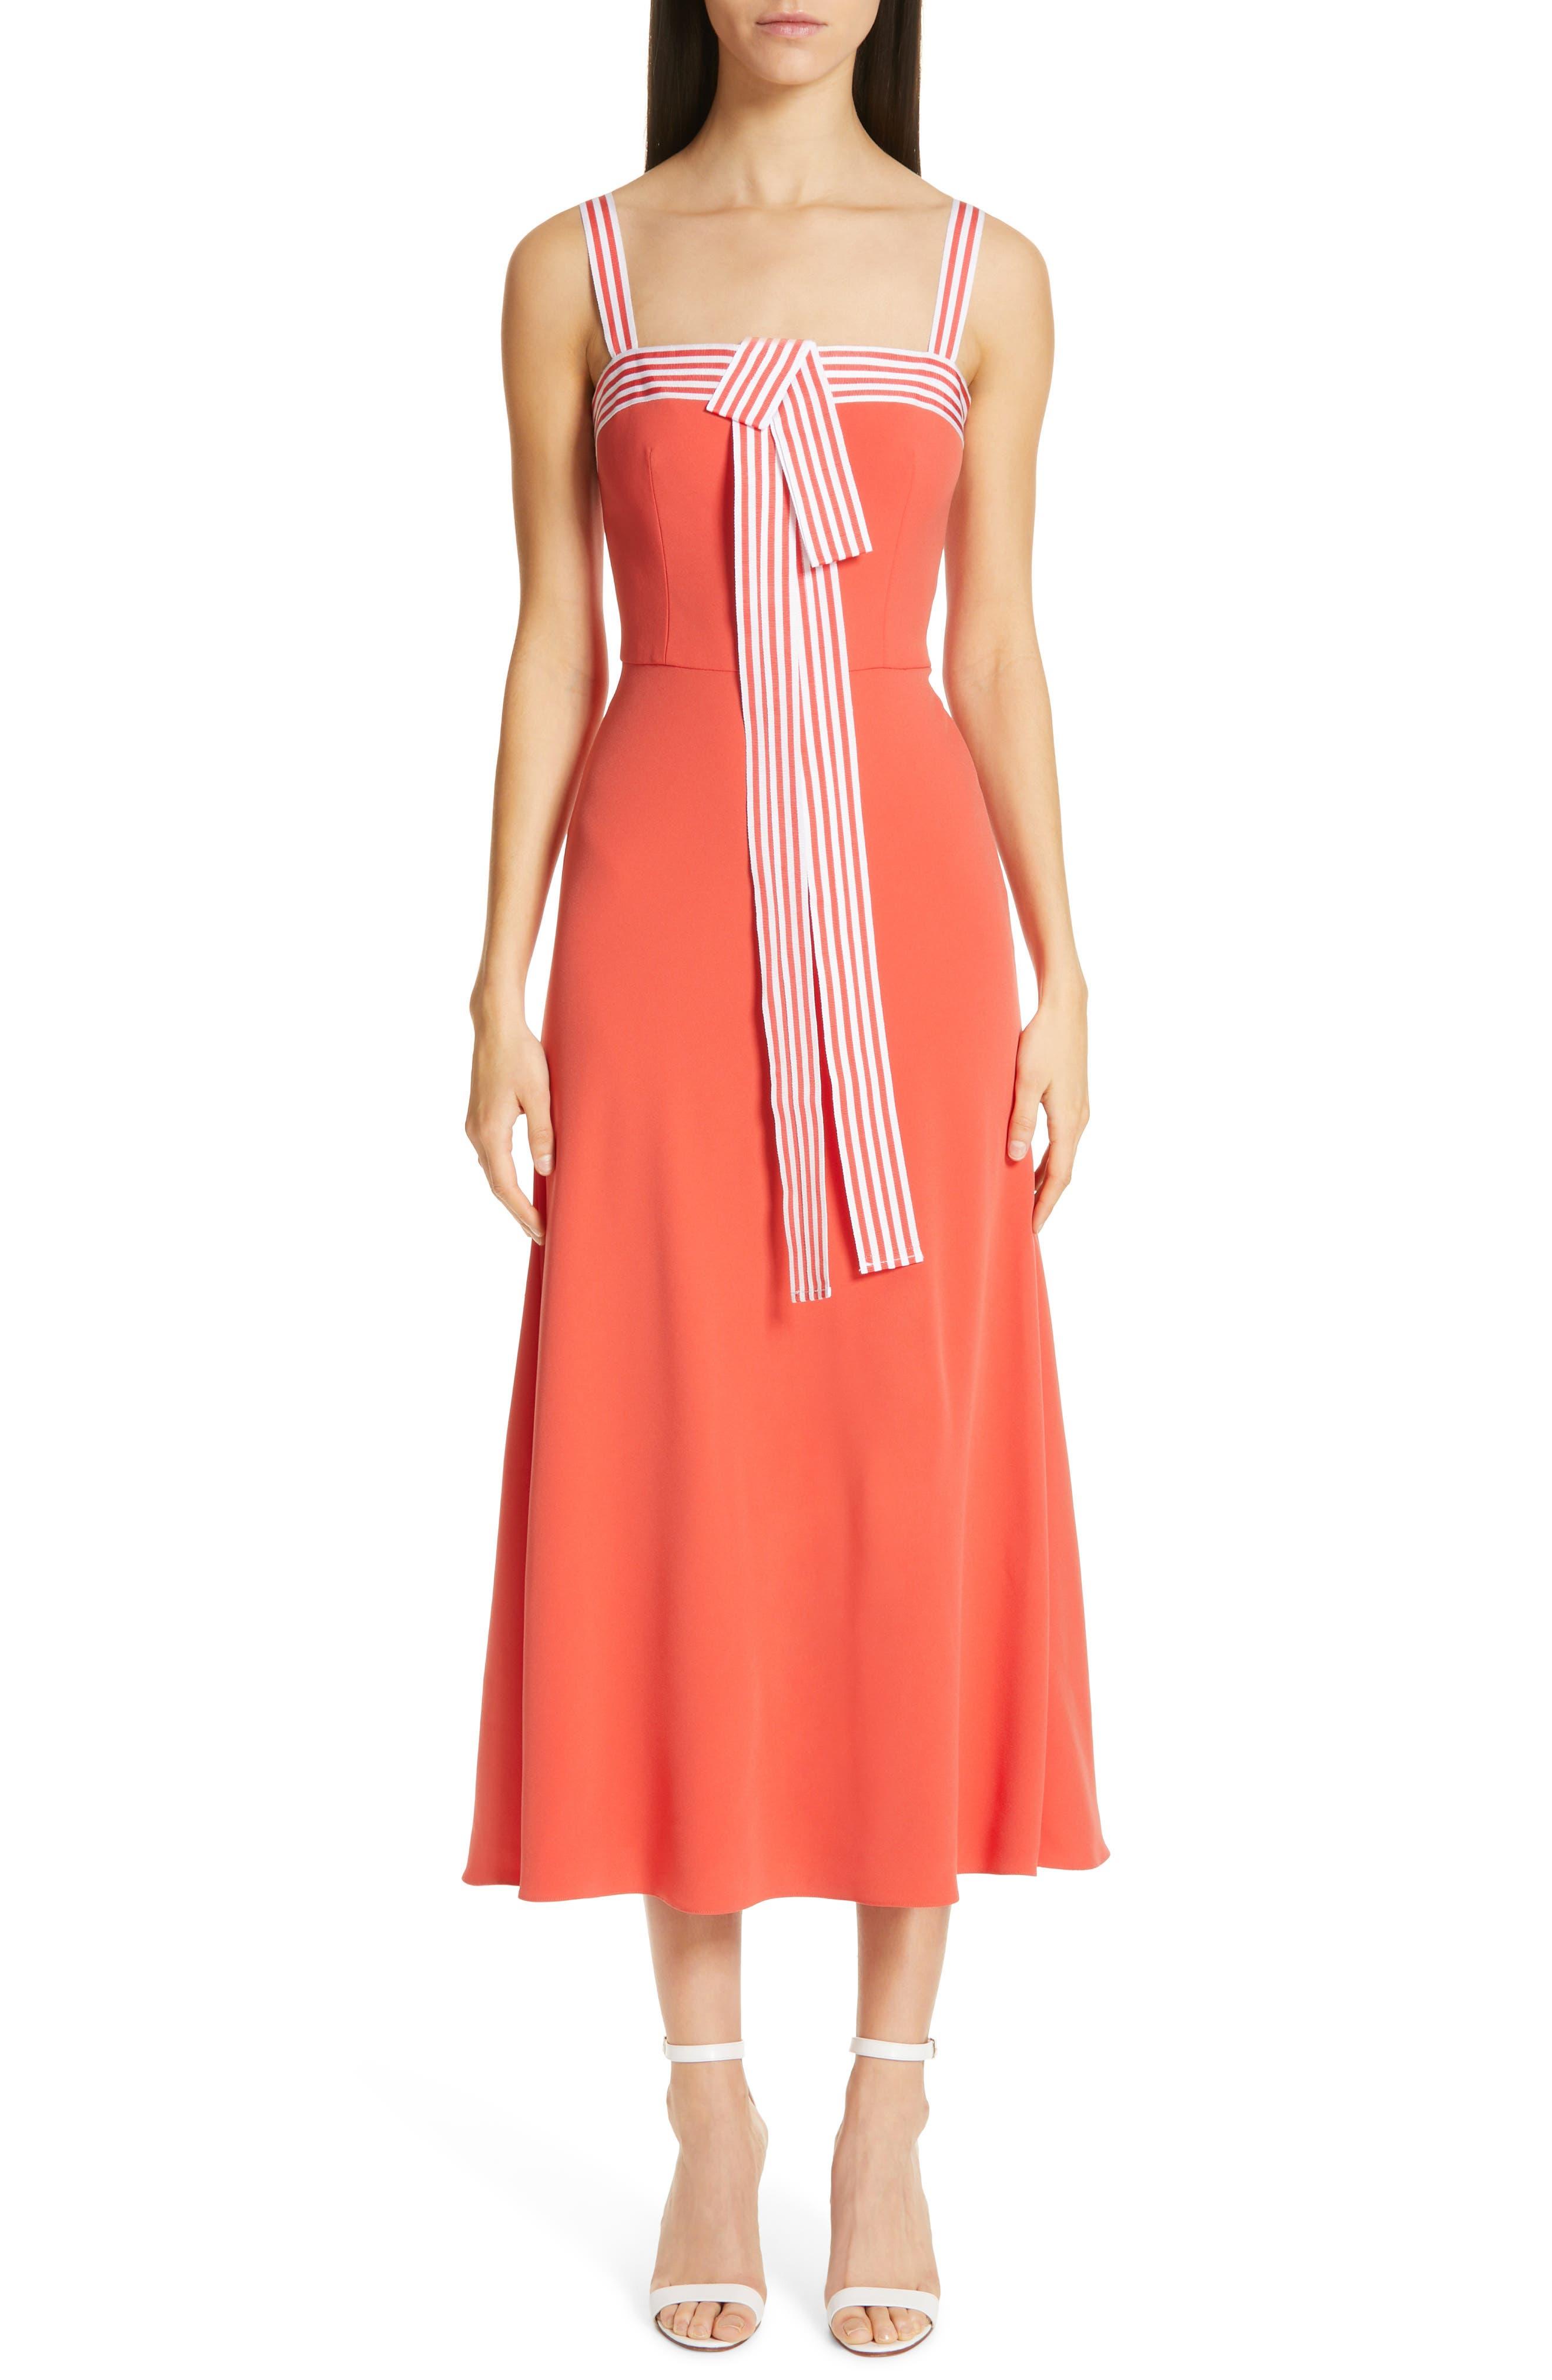 Lela Rose Tie Front Dress, Coral